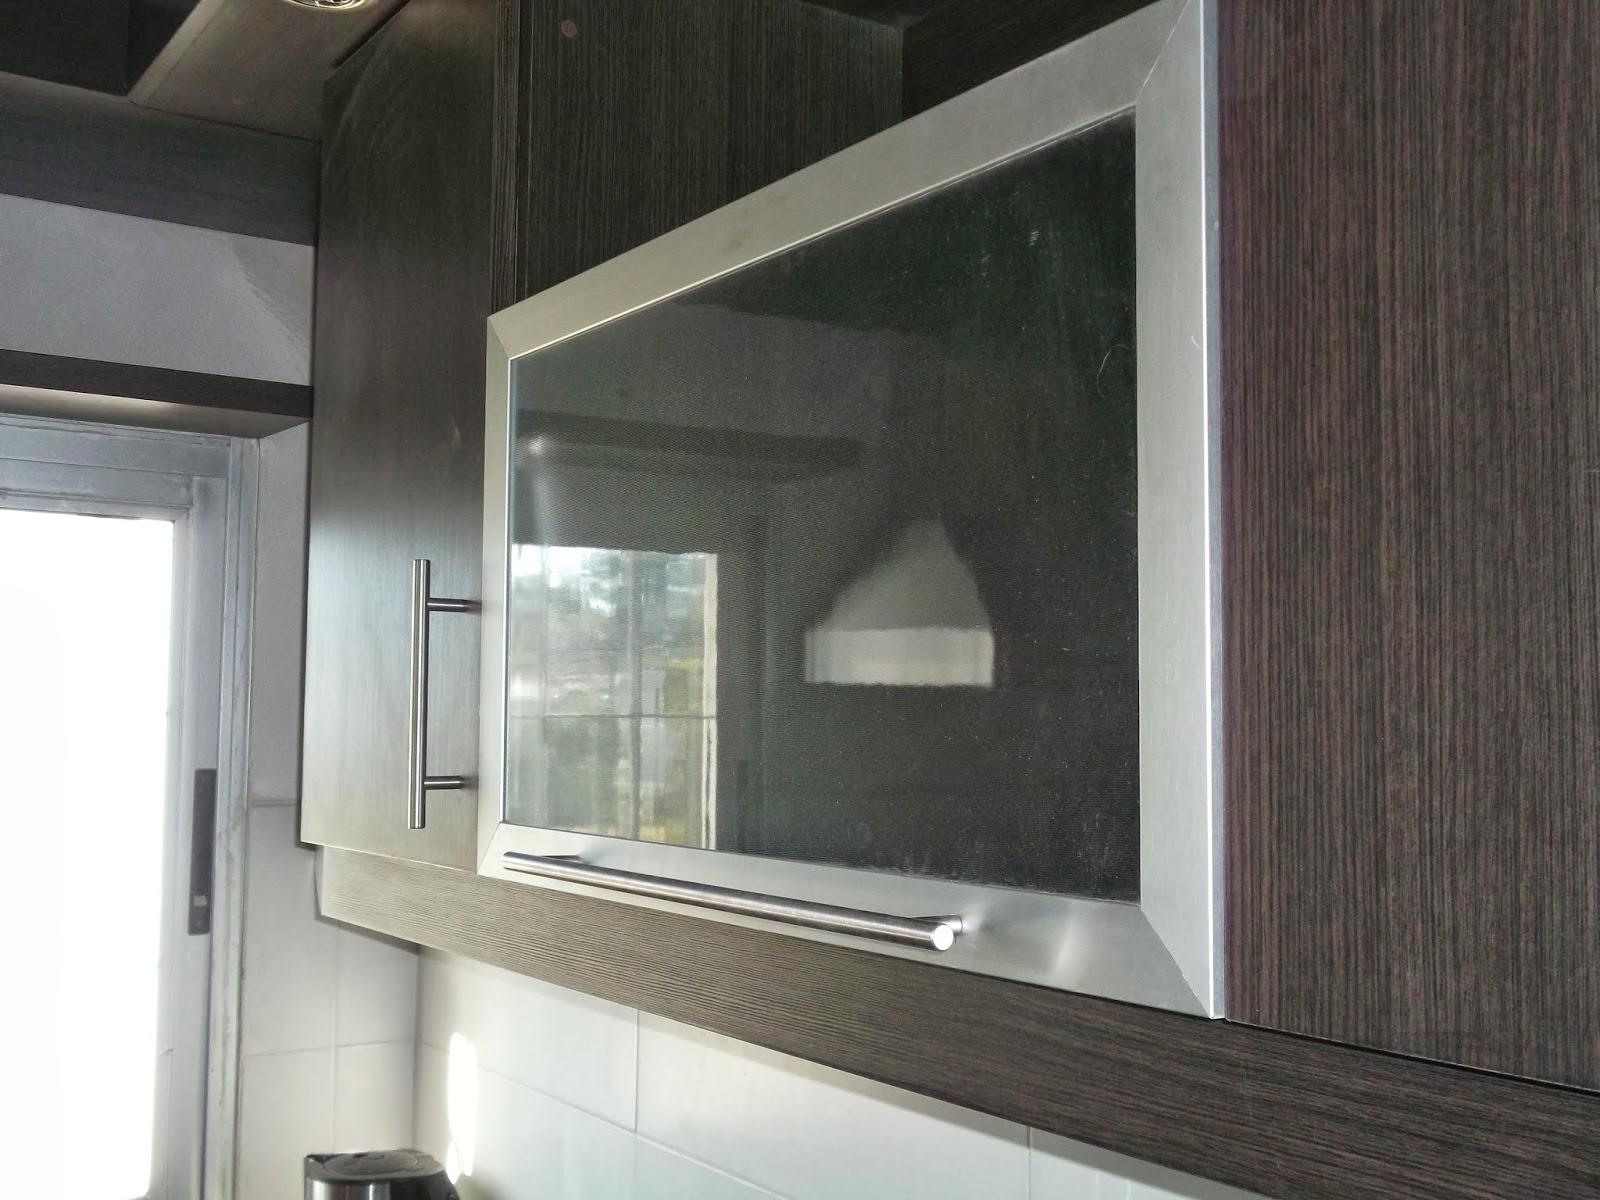 Alfredocarpinteriagral cocinas - Tirador puerta aluminio ...